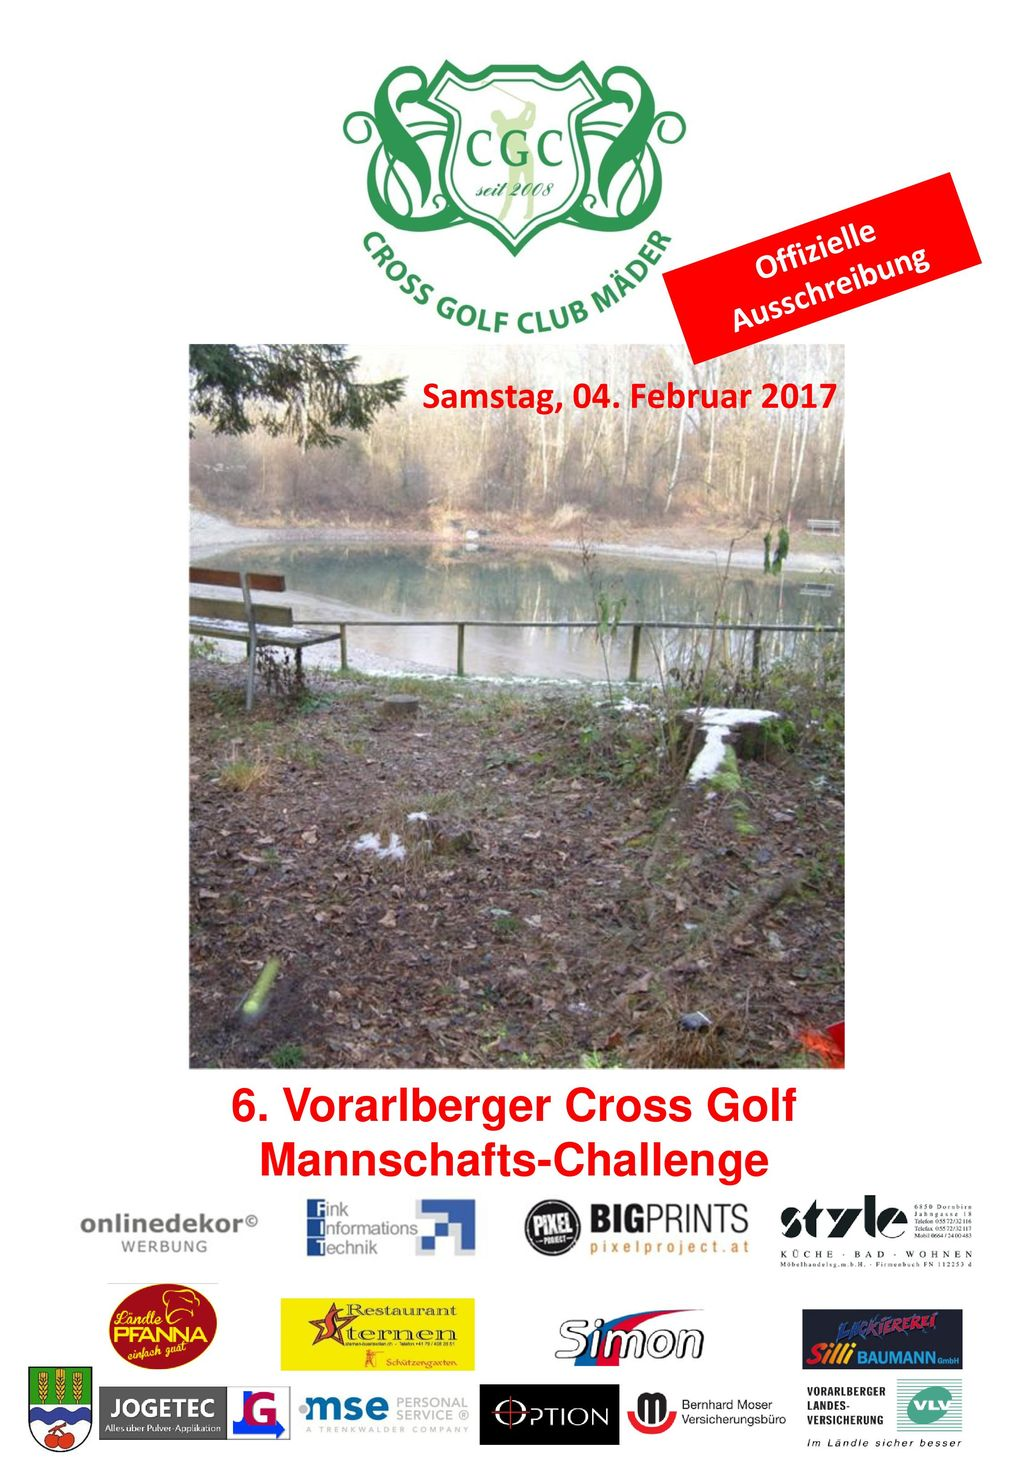 6. Vorarlberger Cross Golf Mannschafts-Challenge